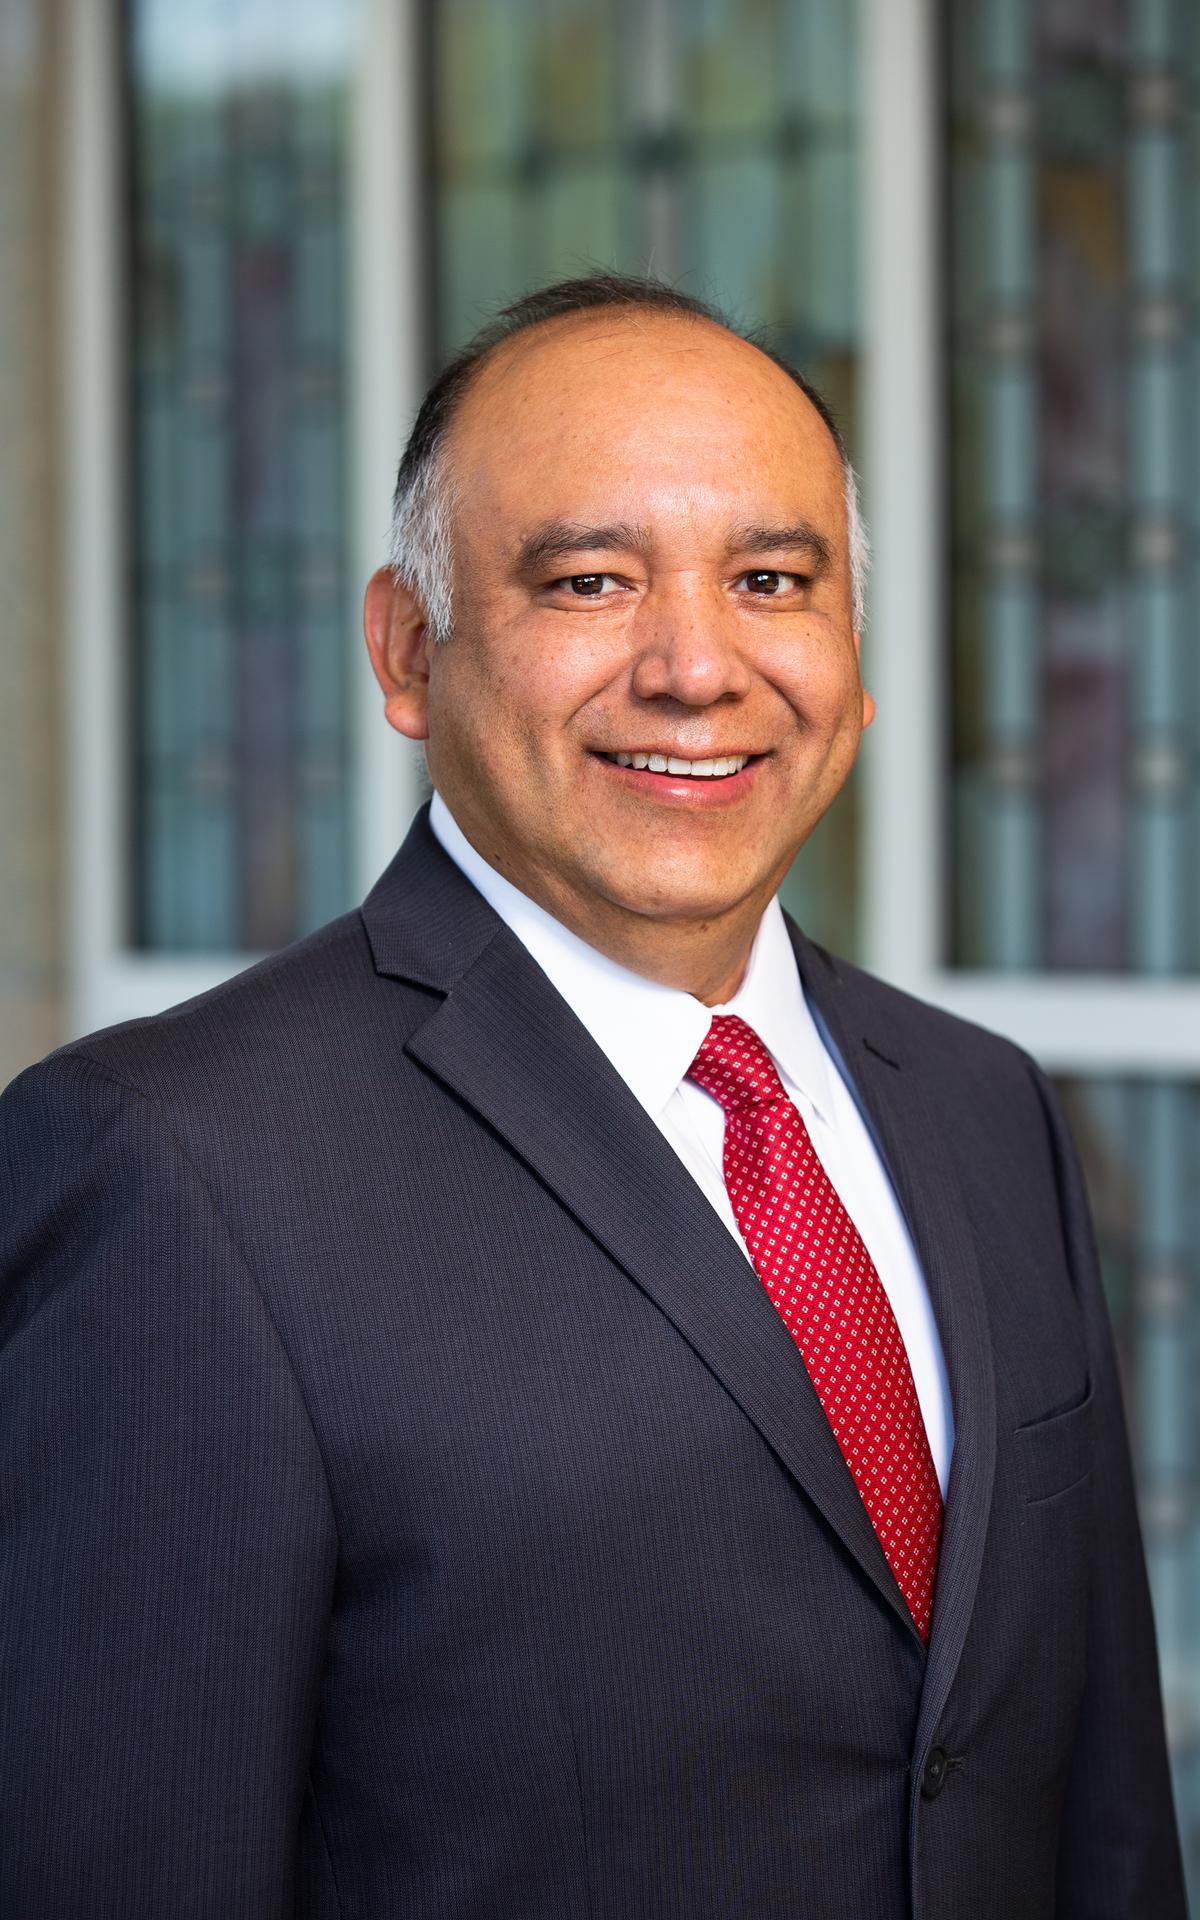 Élder Moisés Villanueva